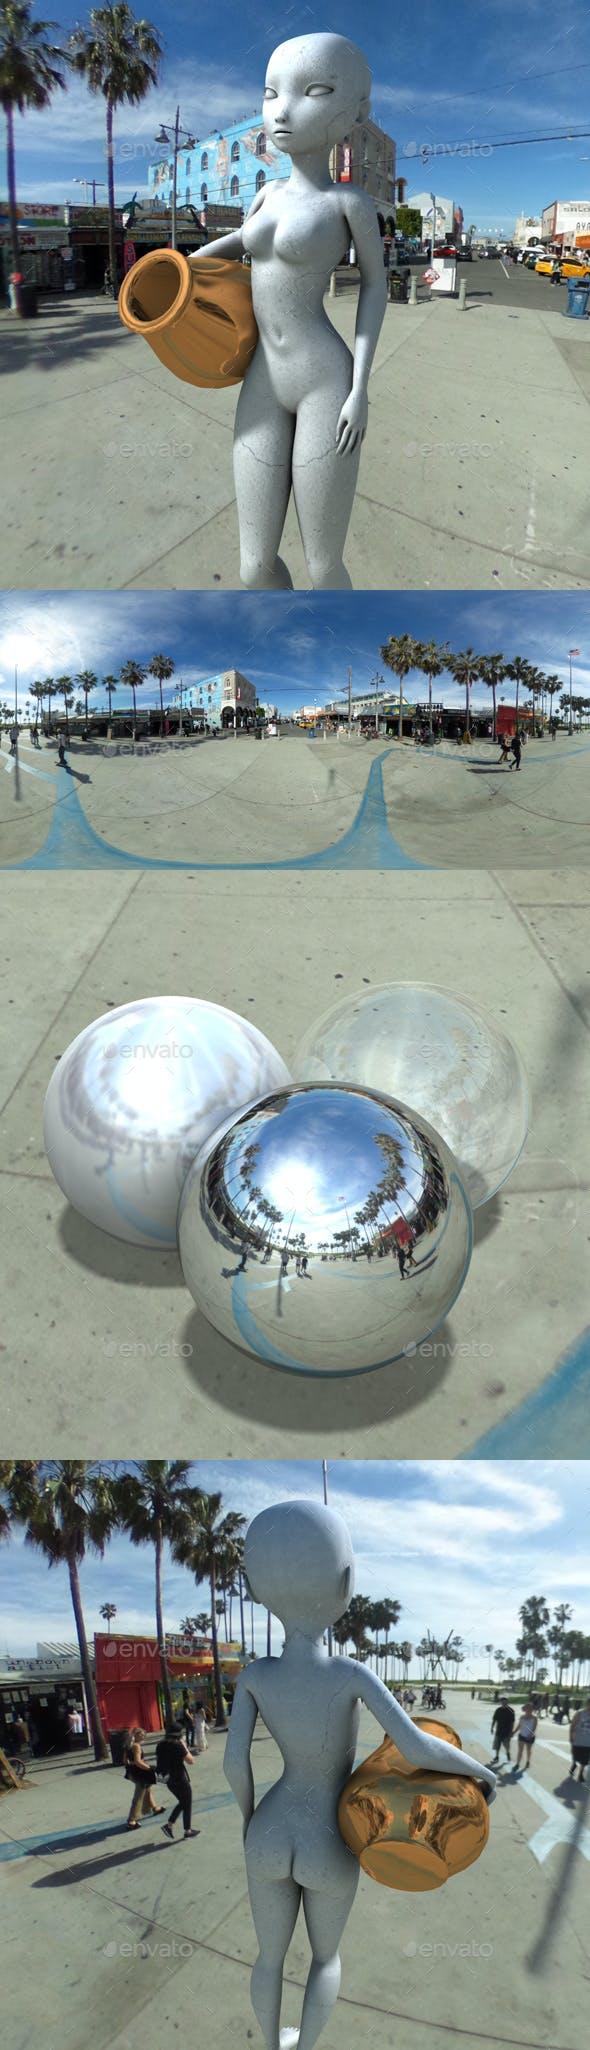 Sunny Skate Park HDRI - 3DOcean Item for Sale